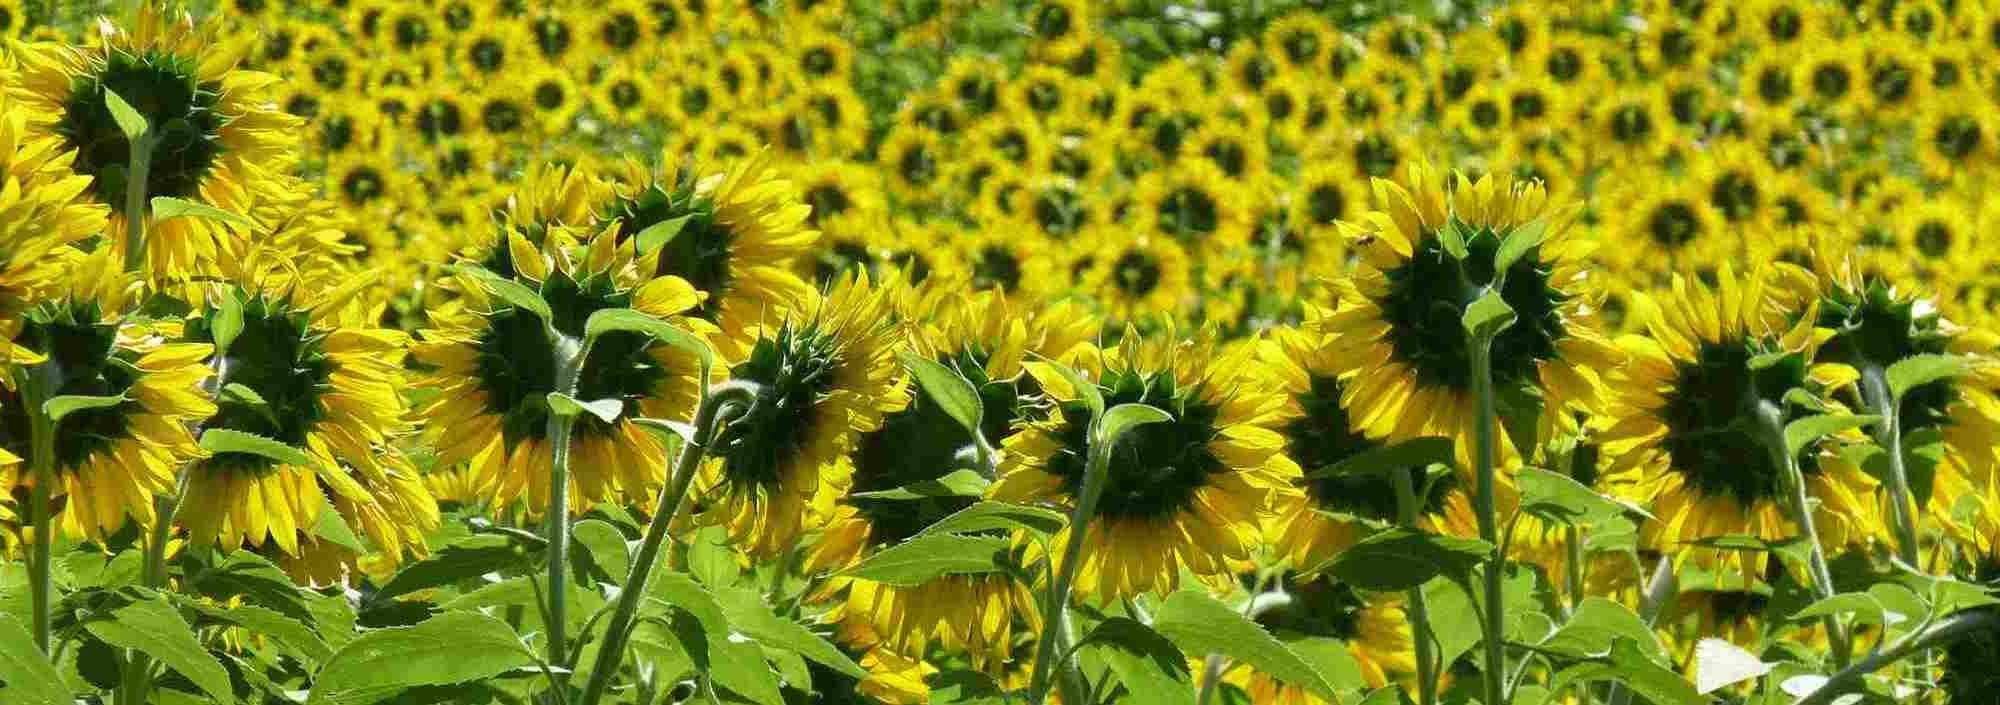 Biofuel Sunseed field